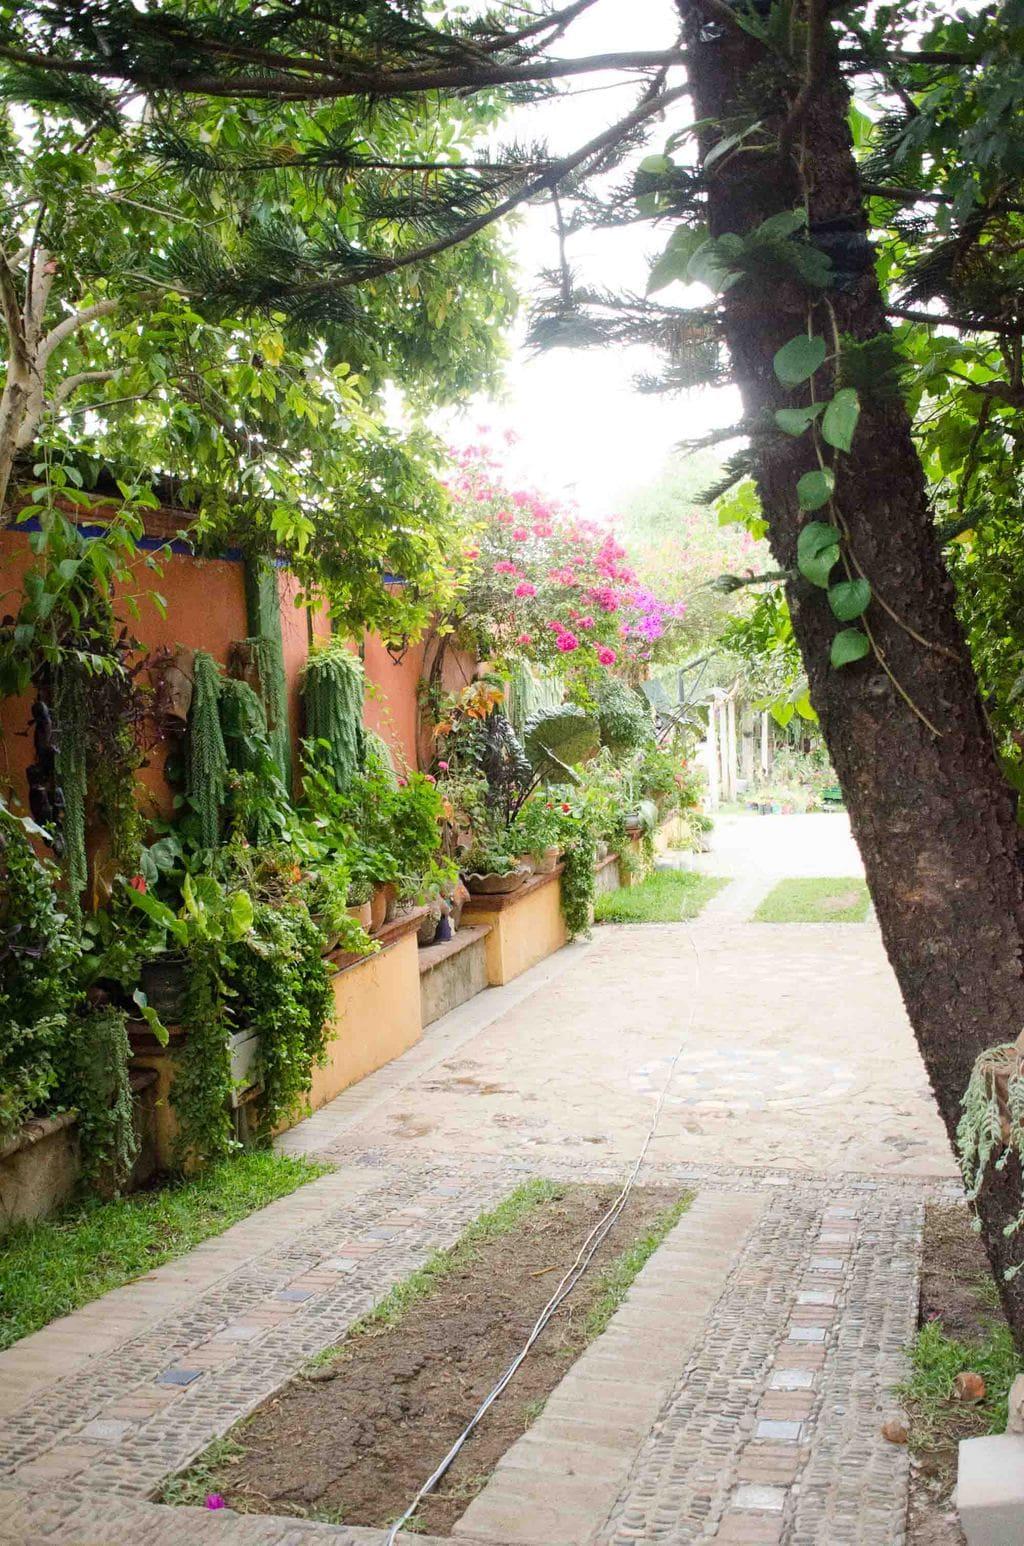 Garden courtyard driveaway in Oaxaca, Mexico